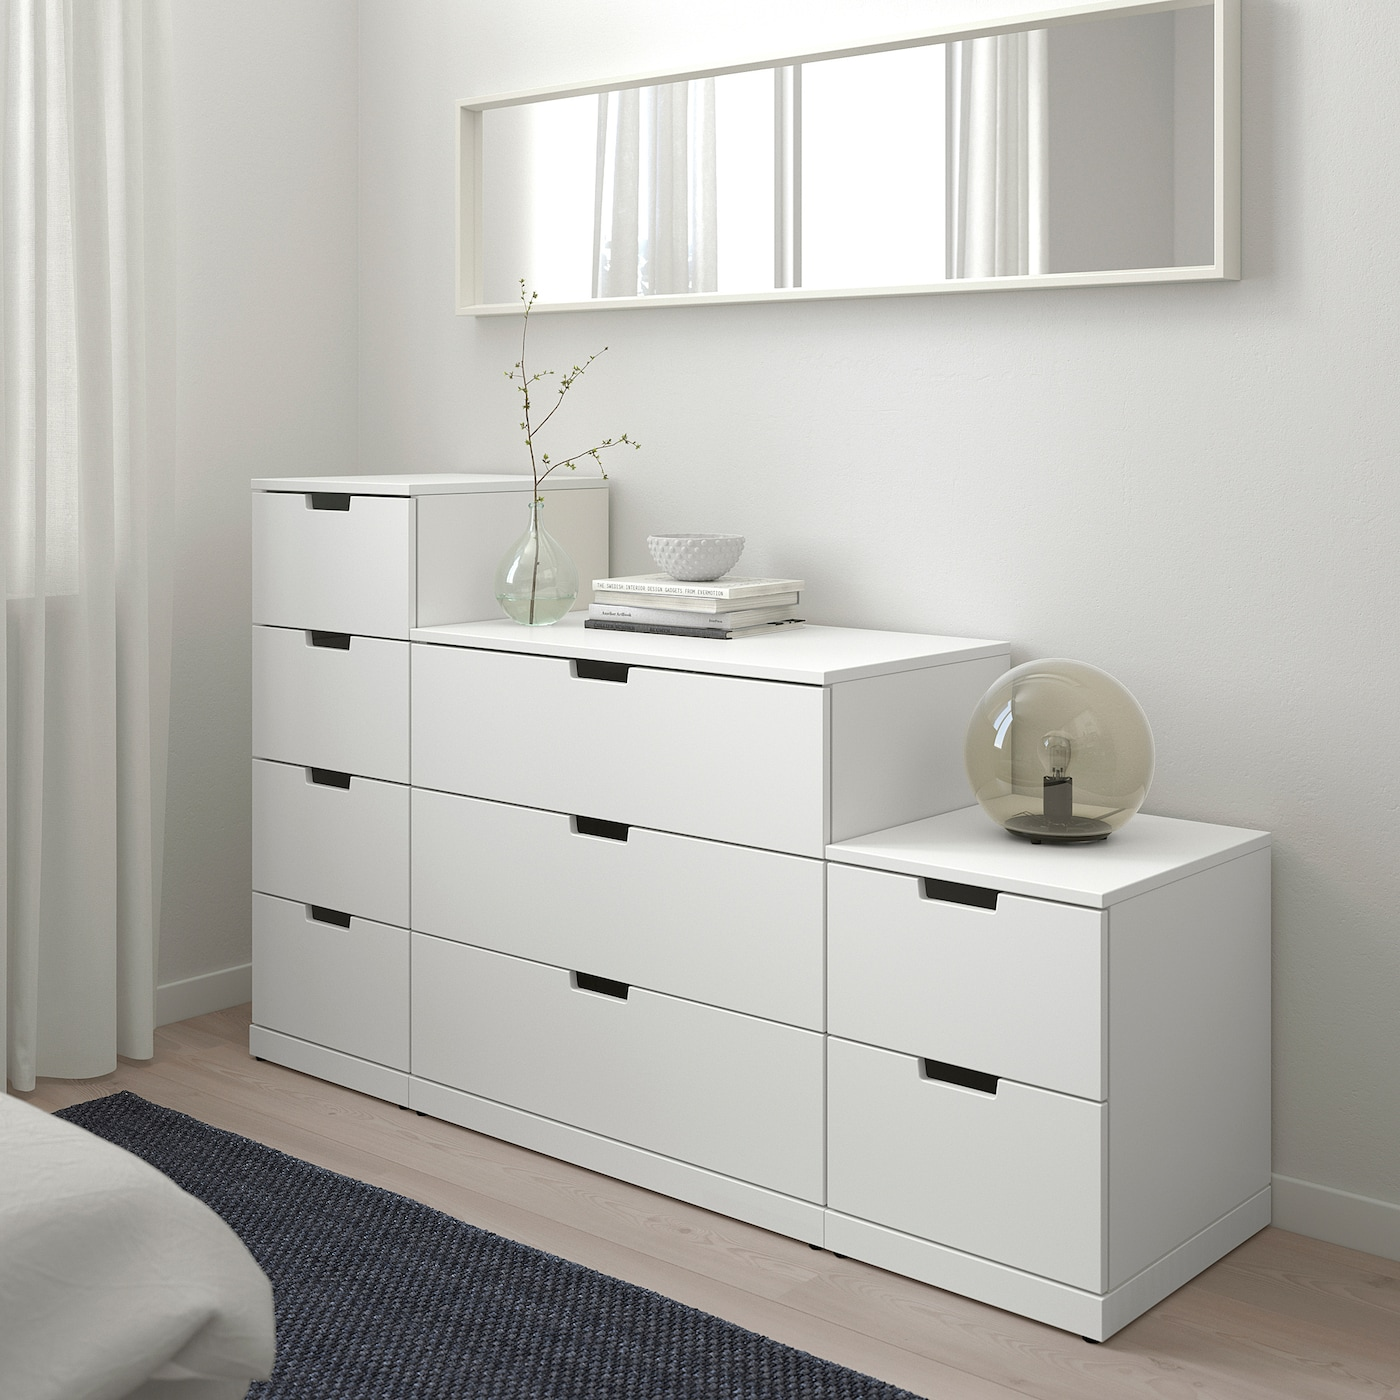 NORDLI Chest of 9 drawers, white, 160x99 cm